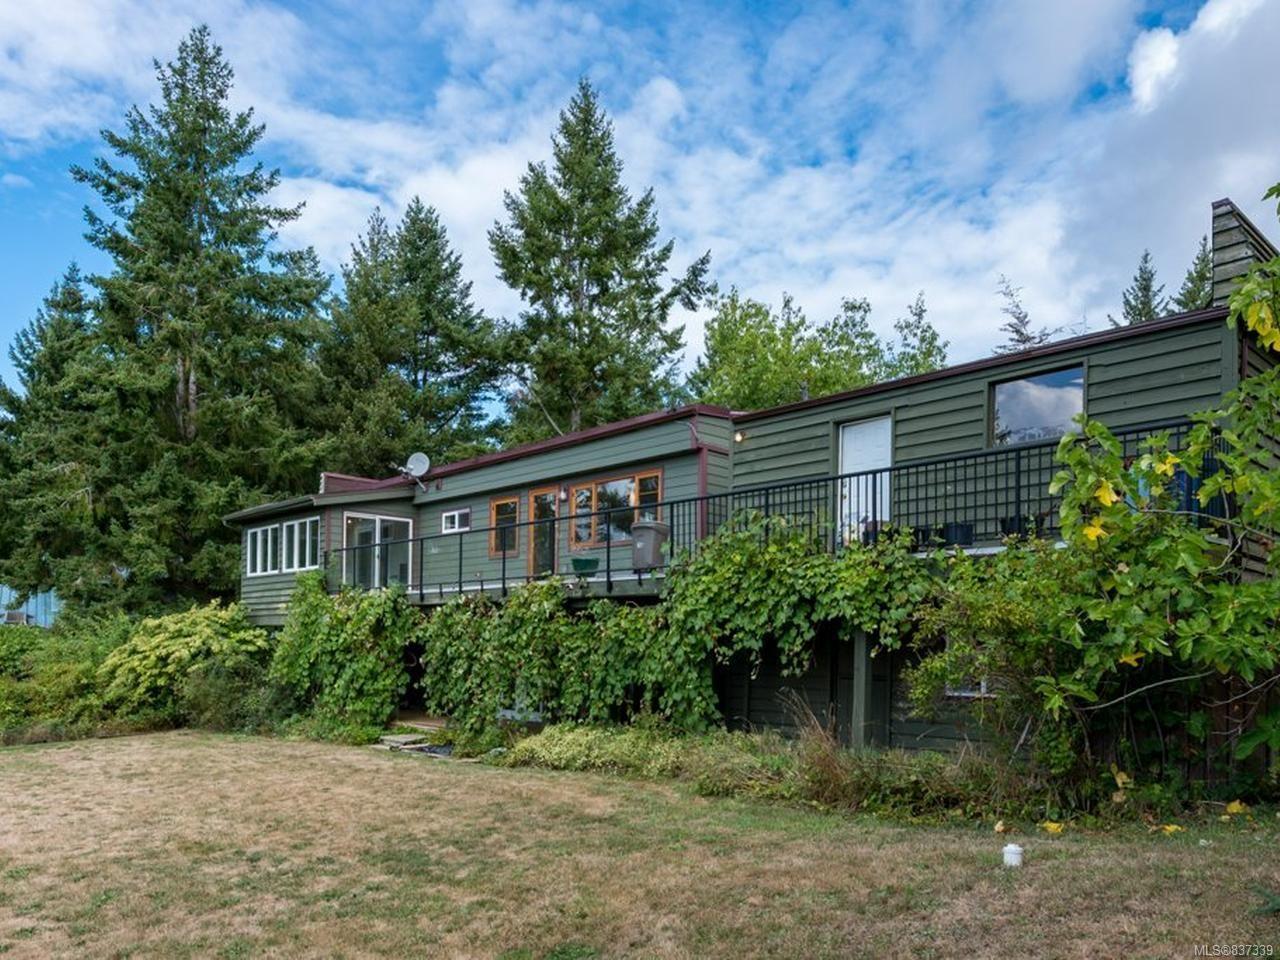 Main Photo: 3305 Kirk Rd in DENMAN ISLAND: Isl Denman Island House for sale (Islands)  : MLS®# 837339